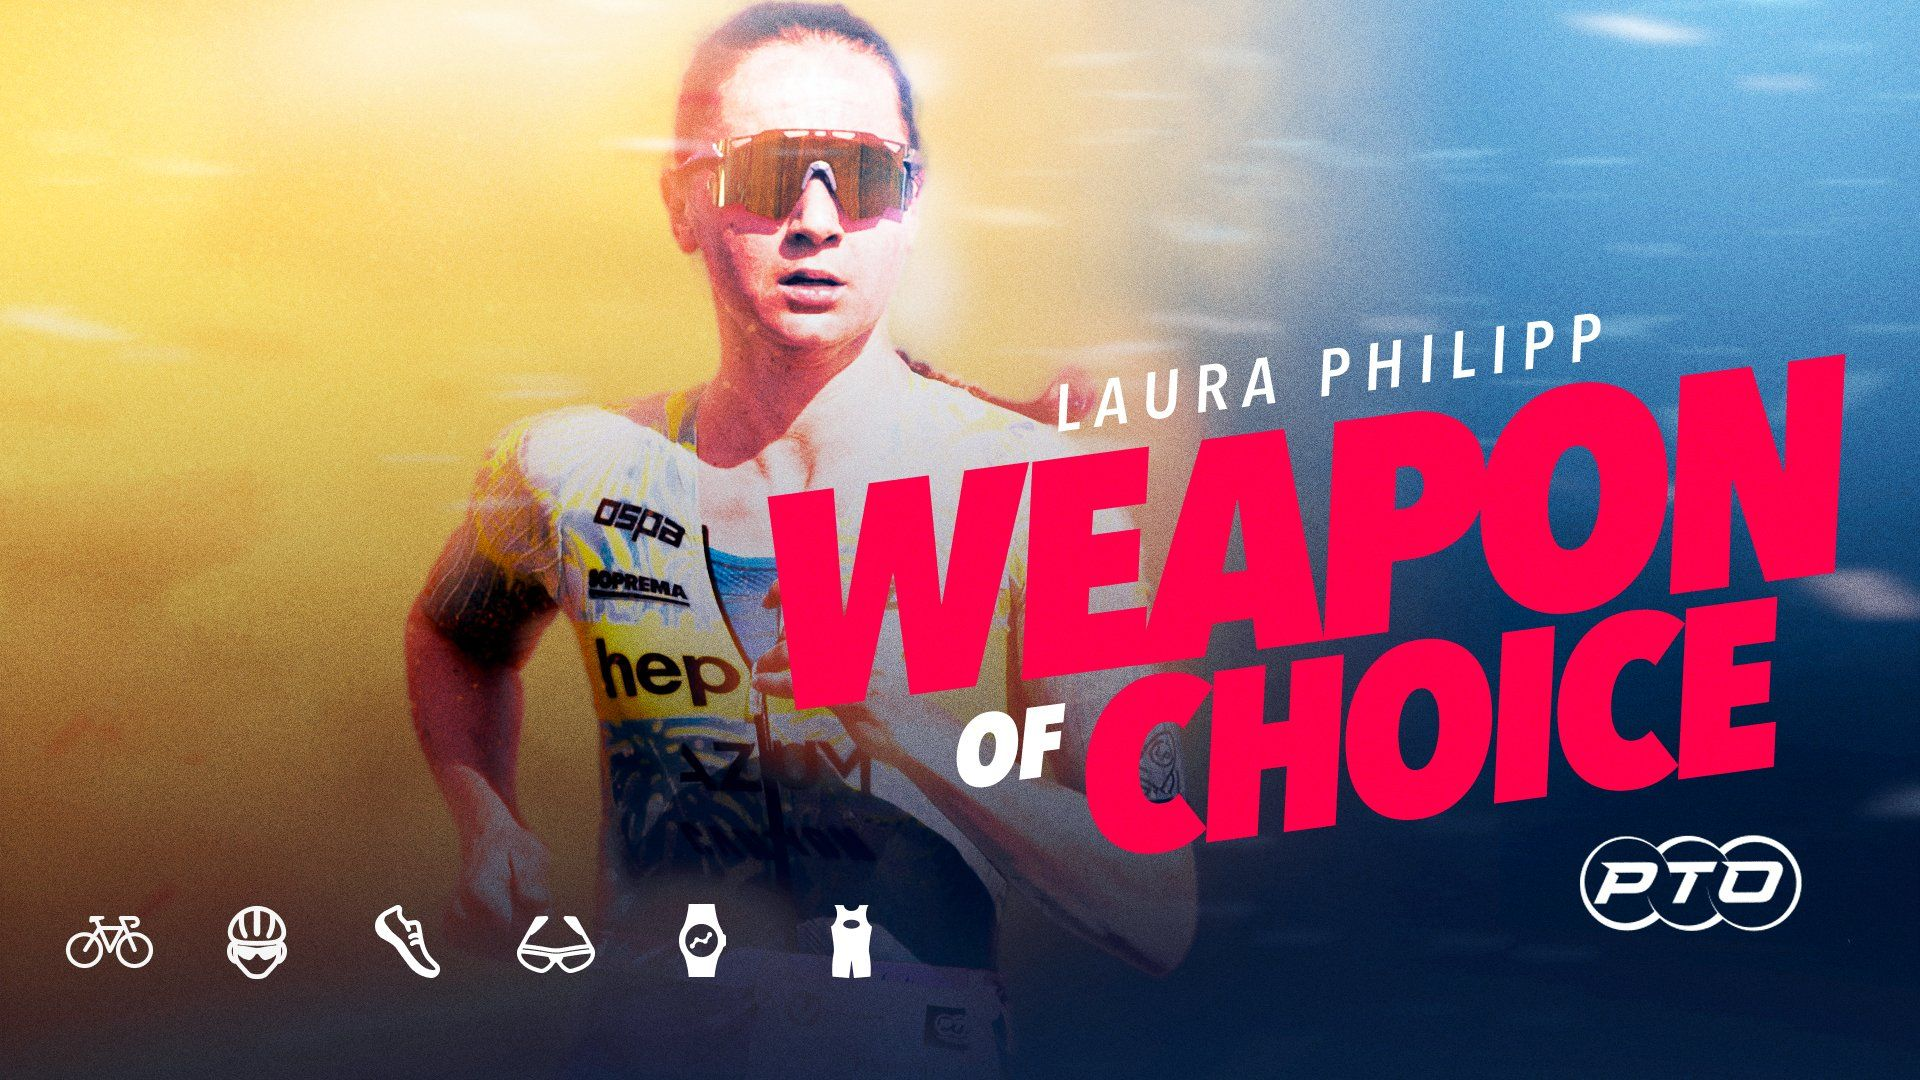 Weapon of Choice || Laura Philipp